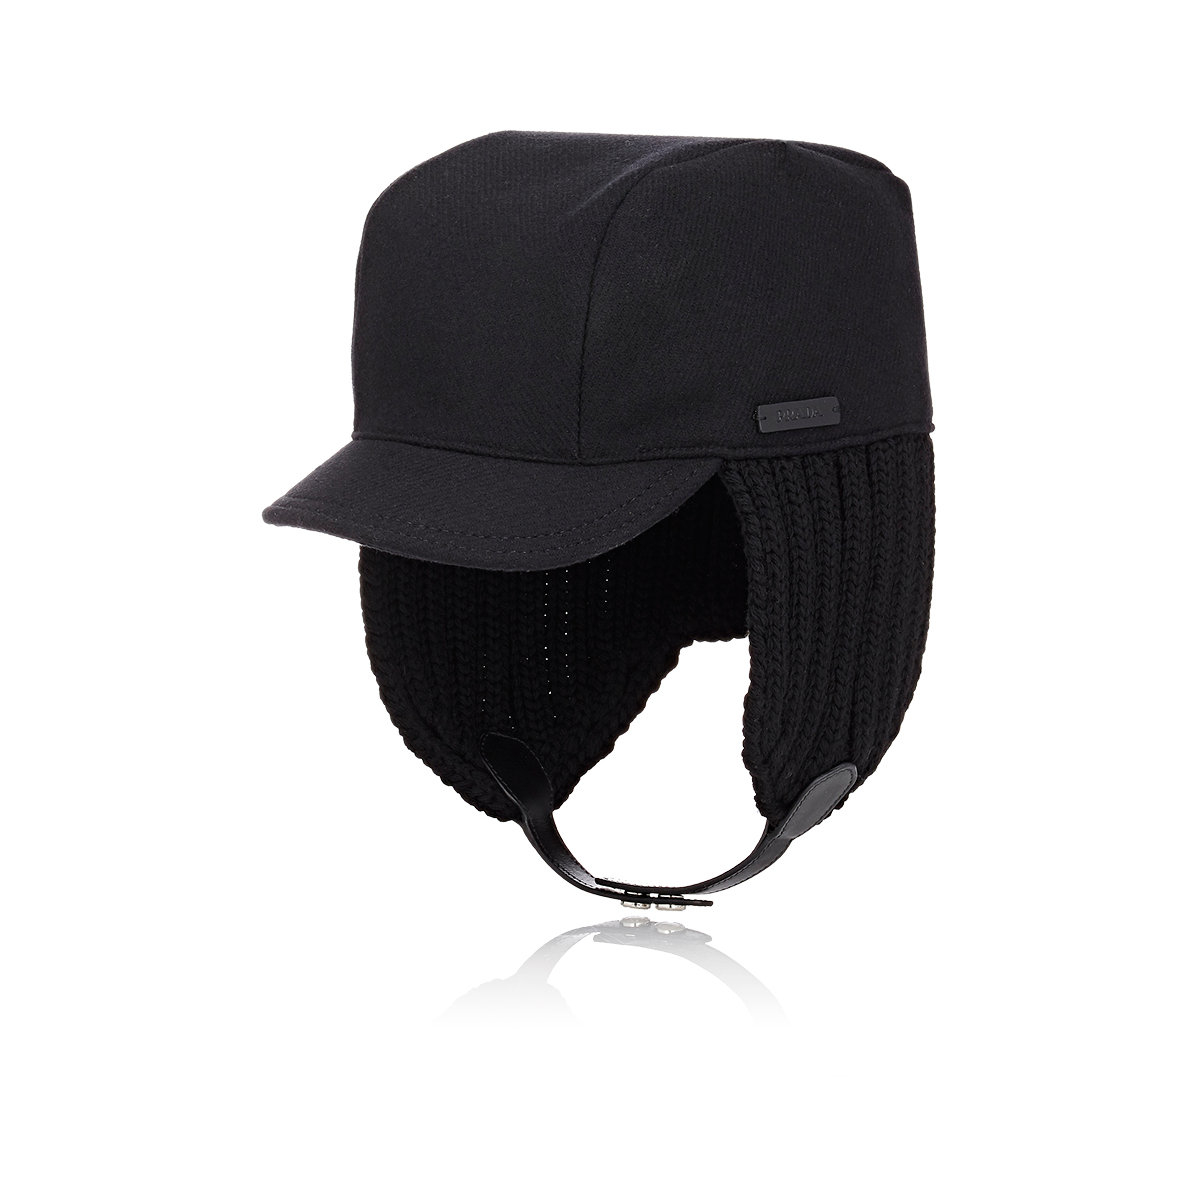 8252171bdb3 Lyst - Prada Trapper Hat in Black for Men